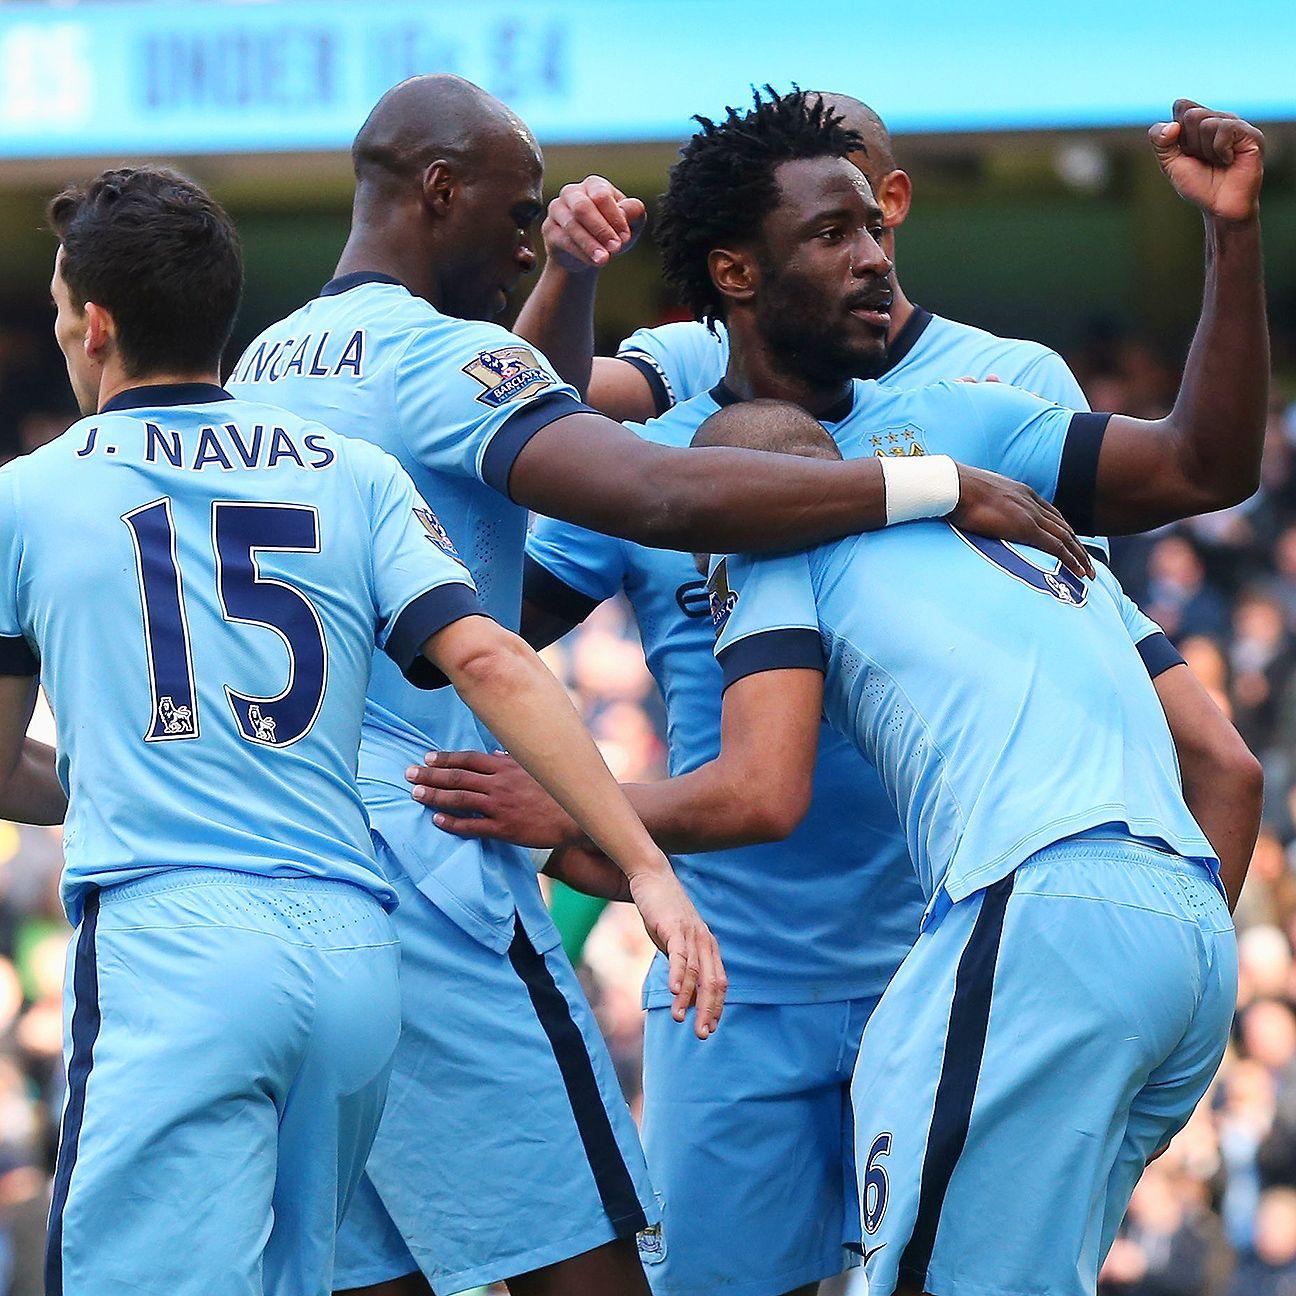 Edin Dzeko's apathetic performance summarises Manchester City's current woe - ESPN FC